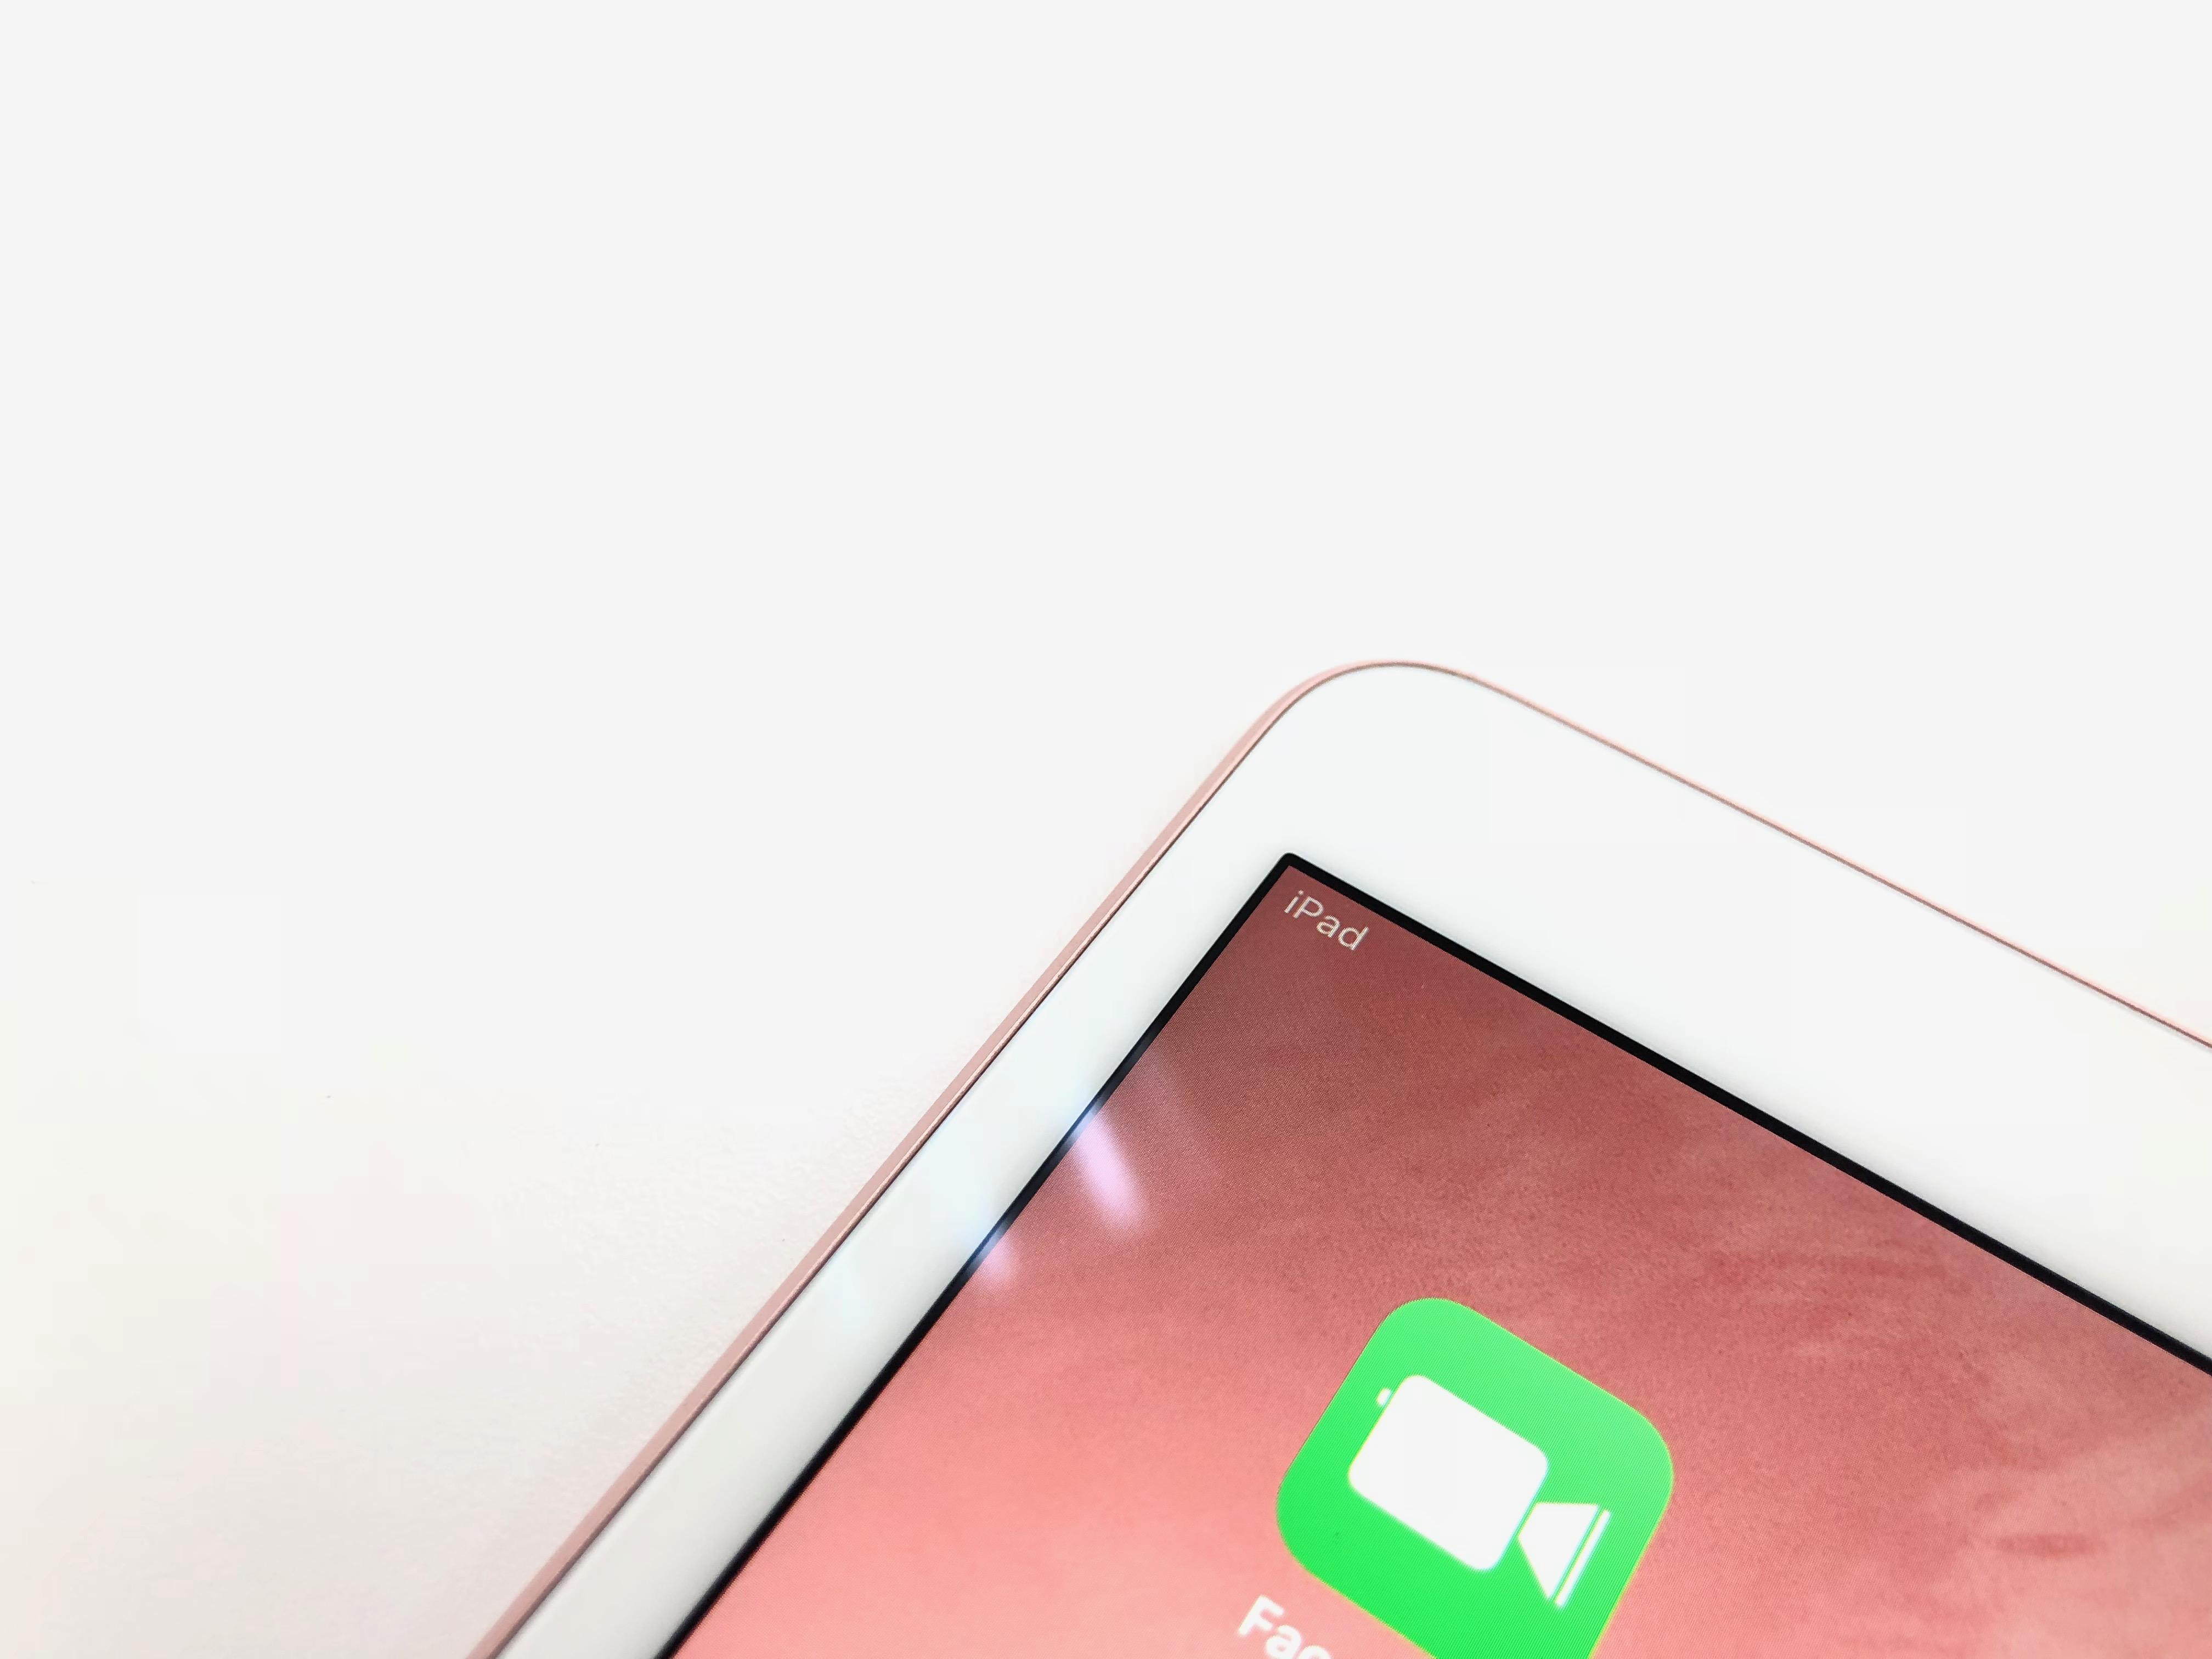 iPad Pro 採用全貼合式螢幕 視差降到最小